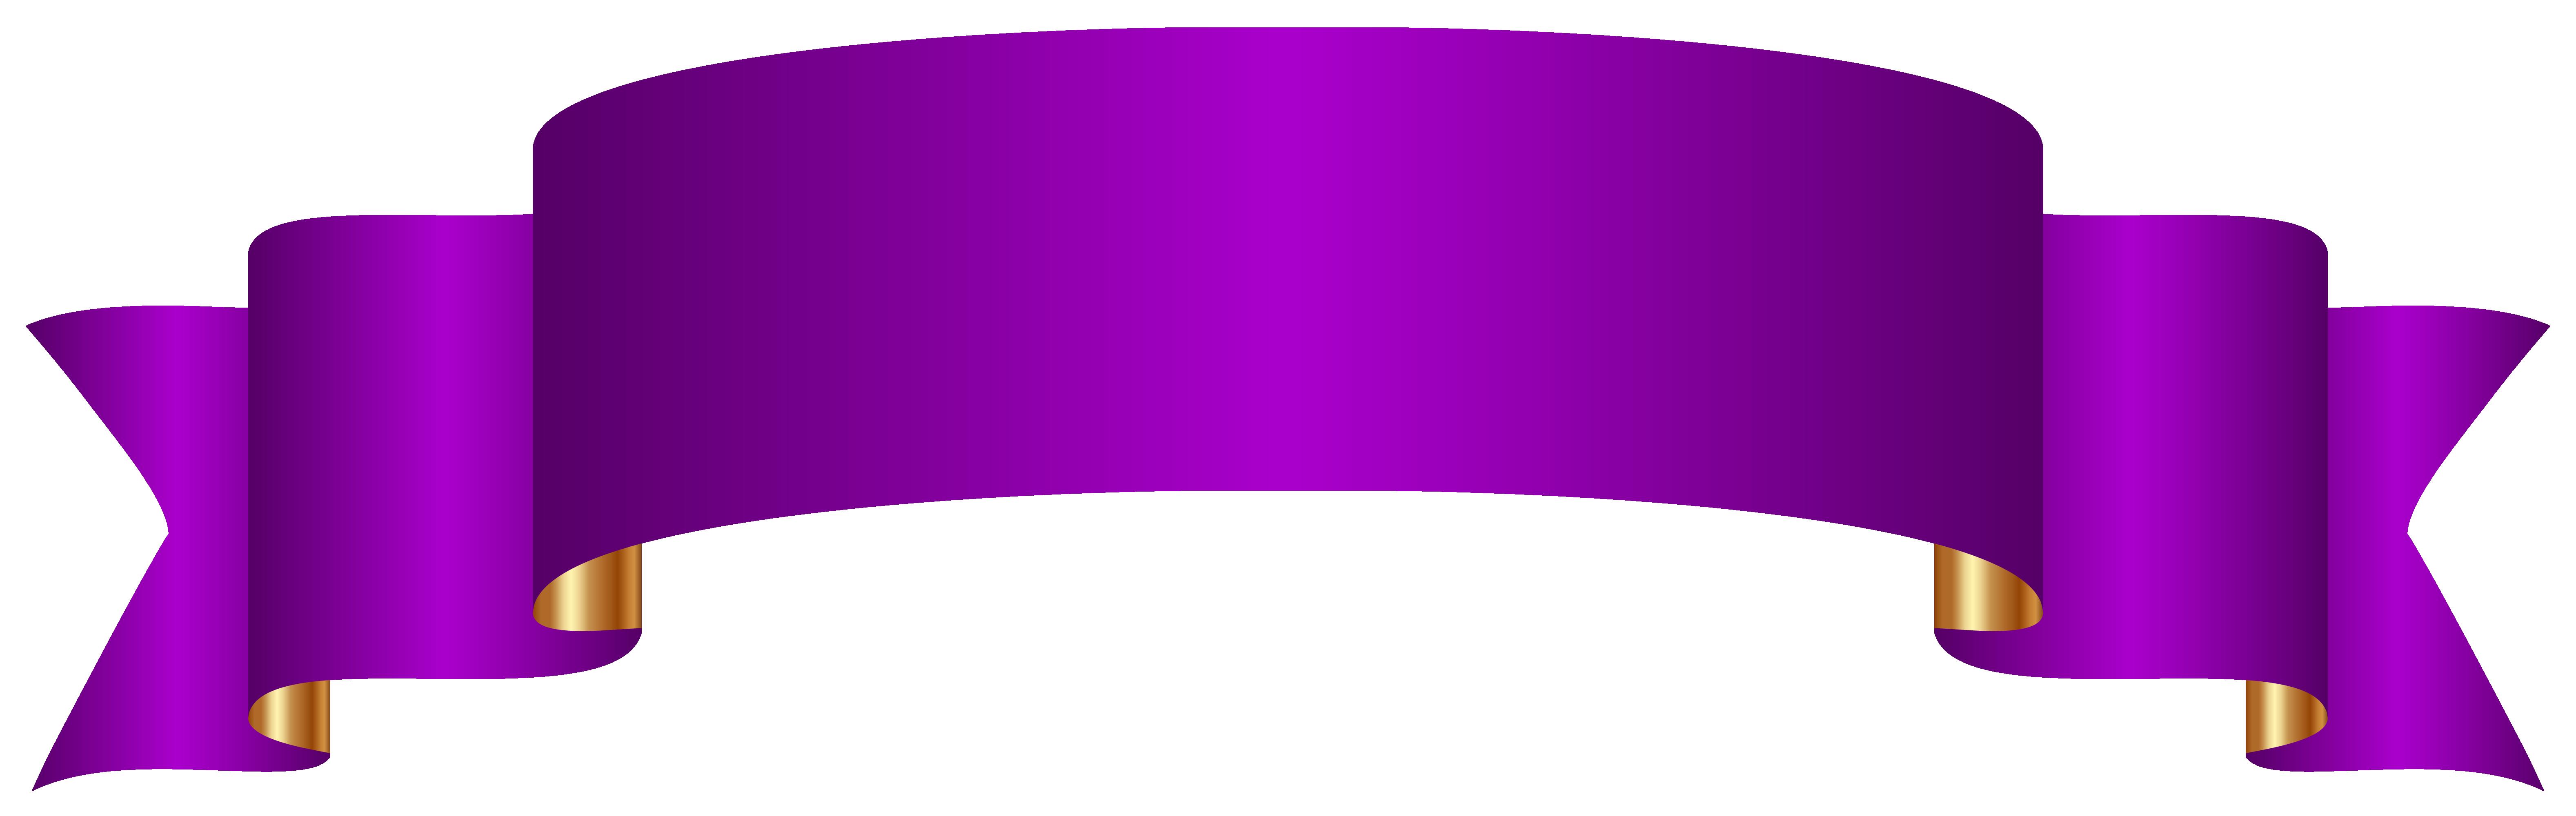 6310x2000 Purple Banner Transparent Png Clip Art Imageu200b Gallery